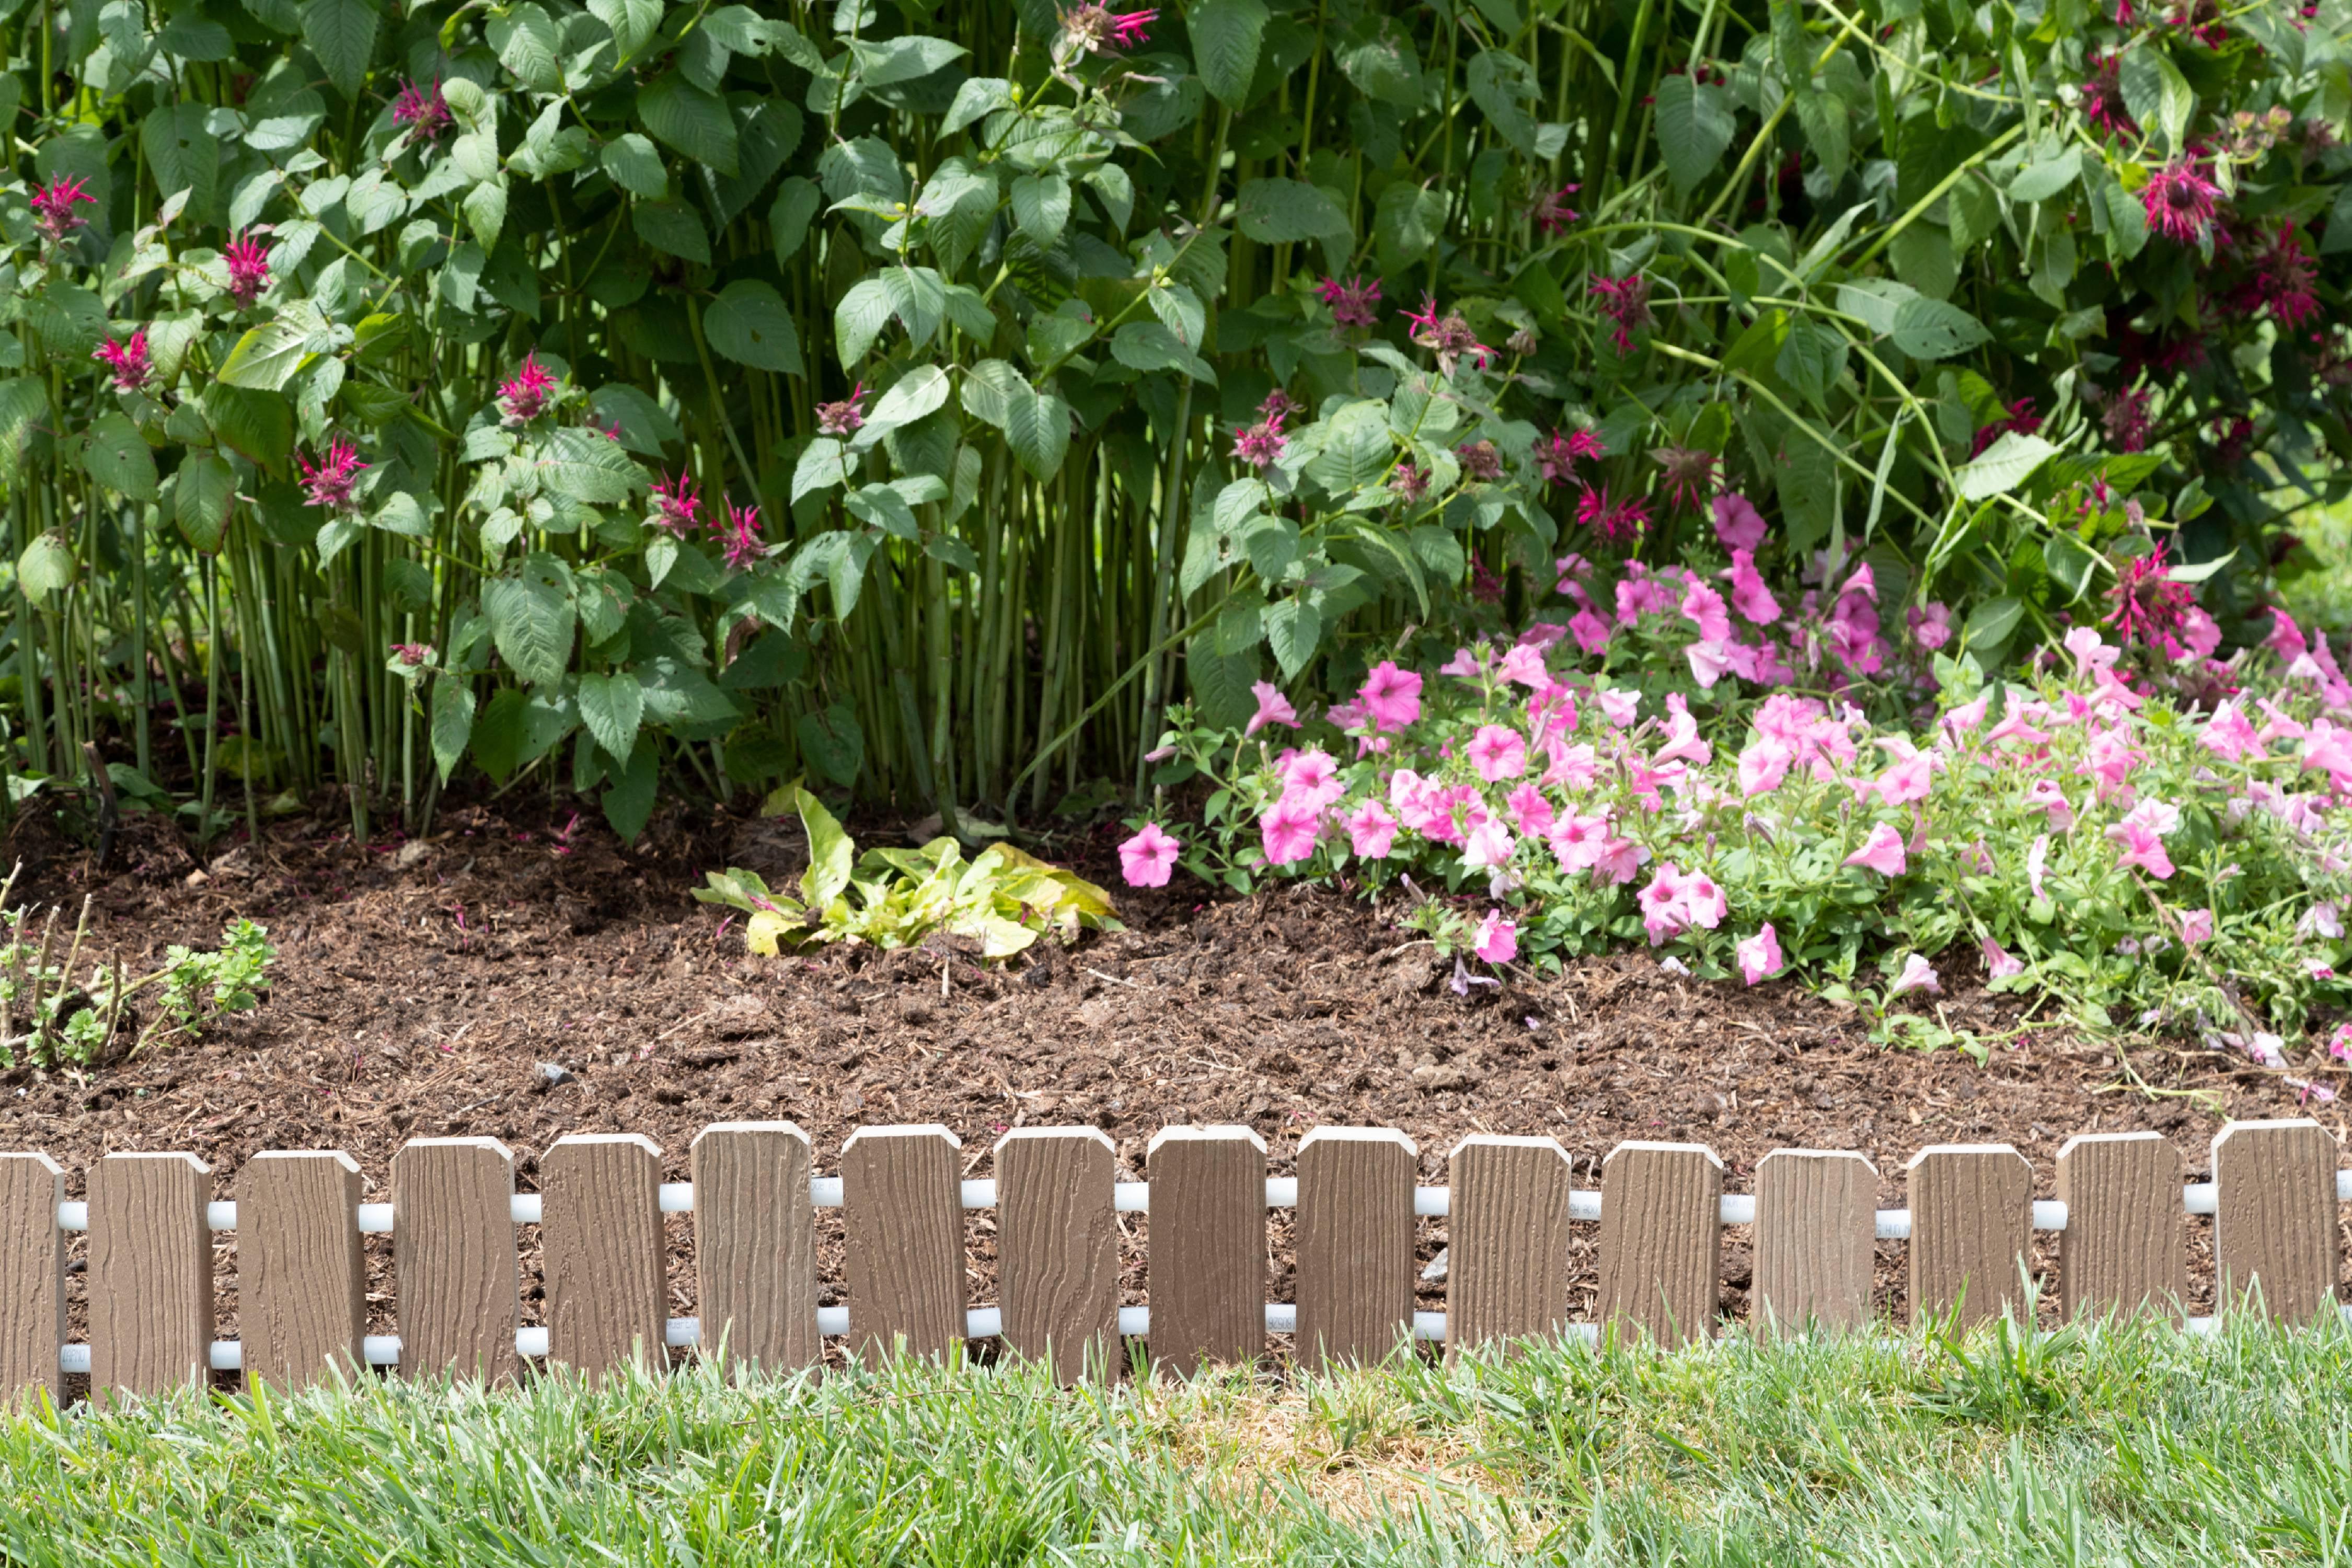 furniture barn usa™ garden edging - evergrain® composite no dig roll up  flower bed edges